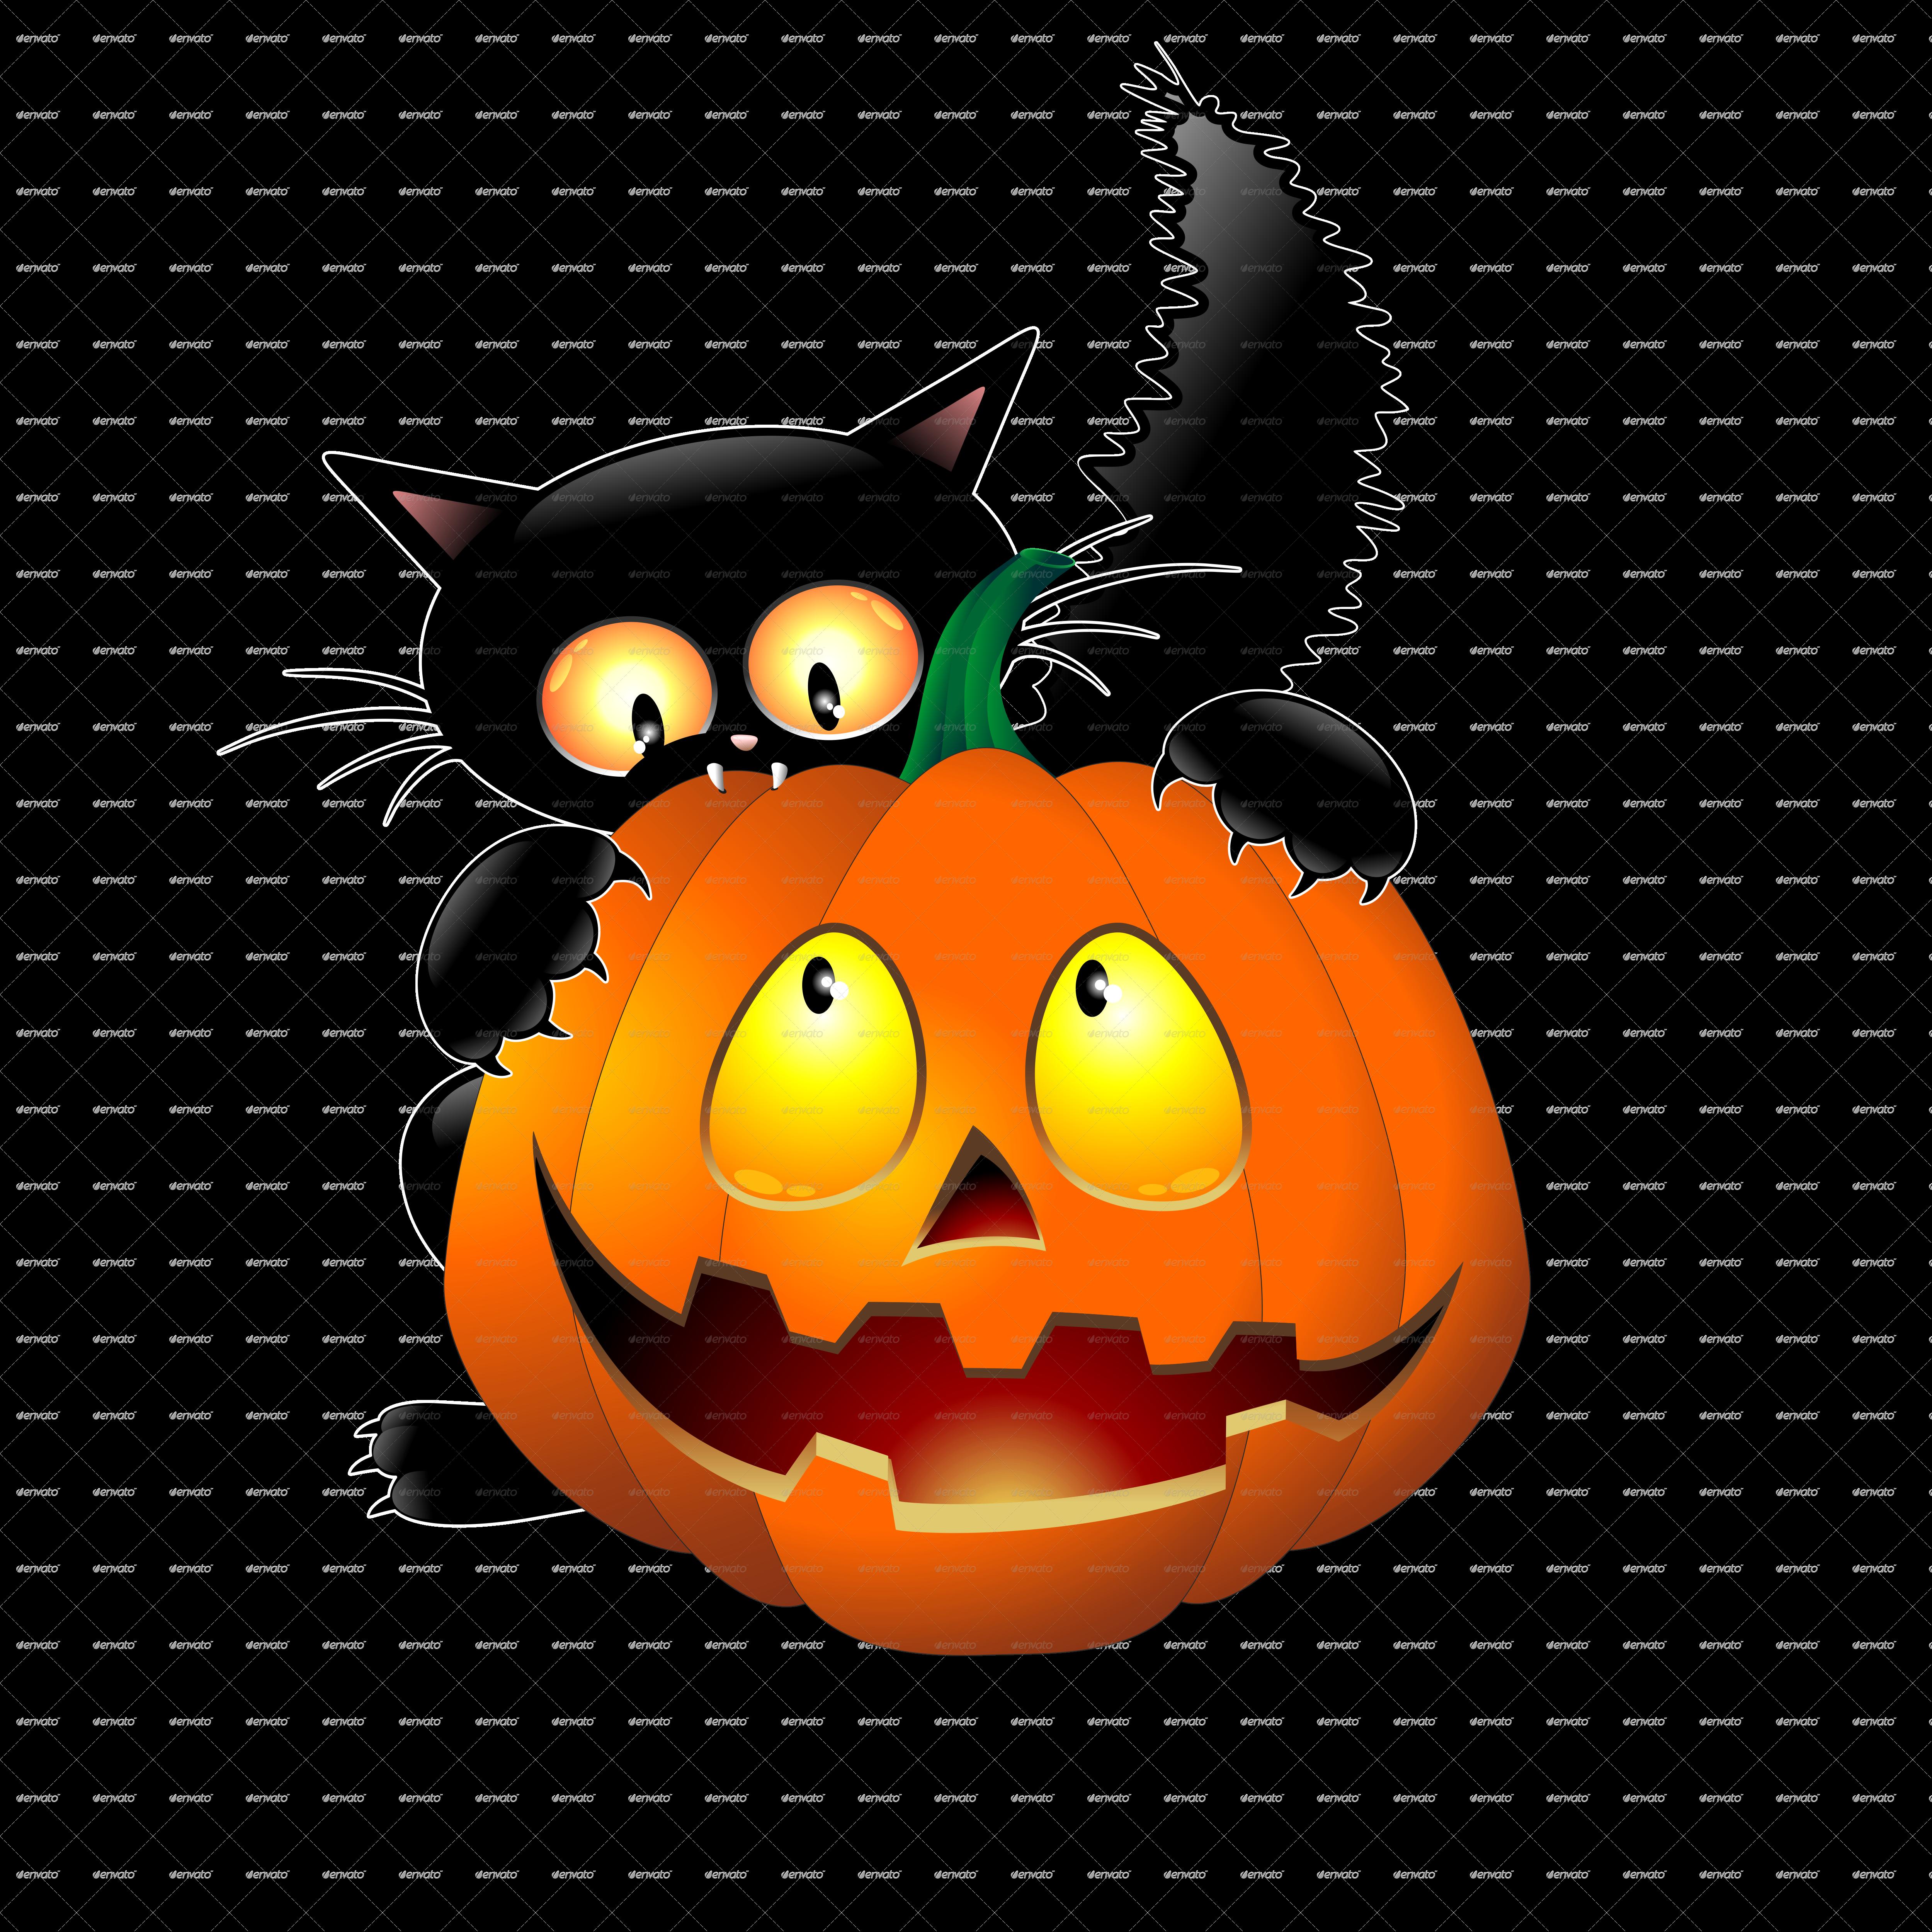 Halloween Pumpkin Cartoon Images.Funny Halloween Cartoon Cat Mouse And Pumpkin Halloween